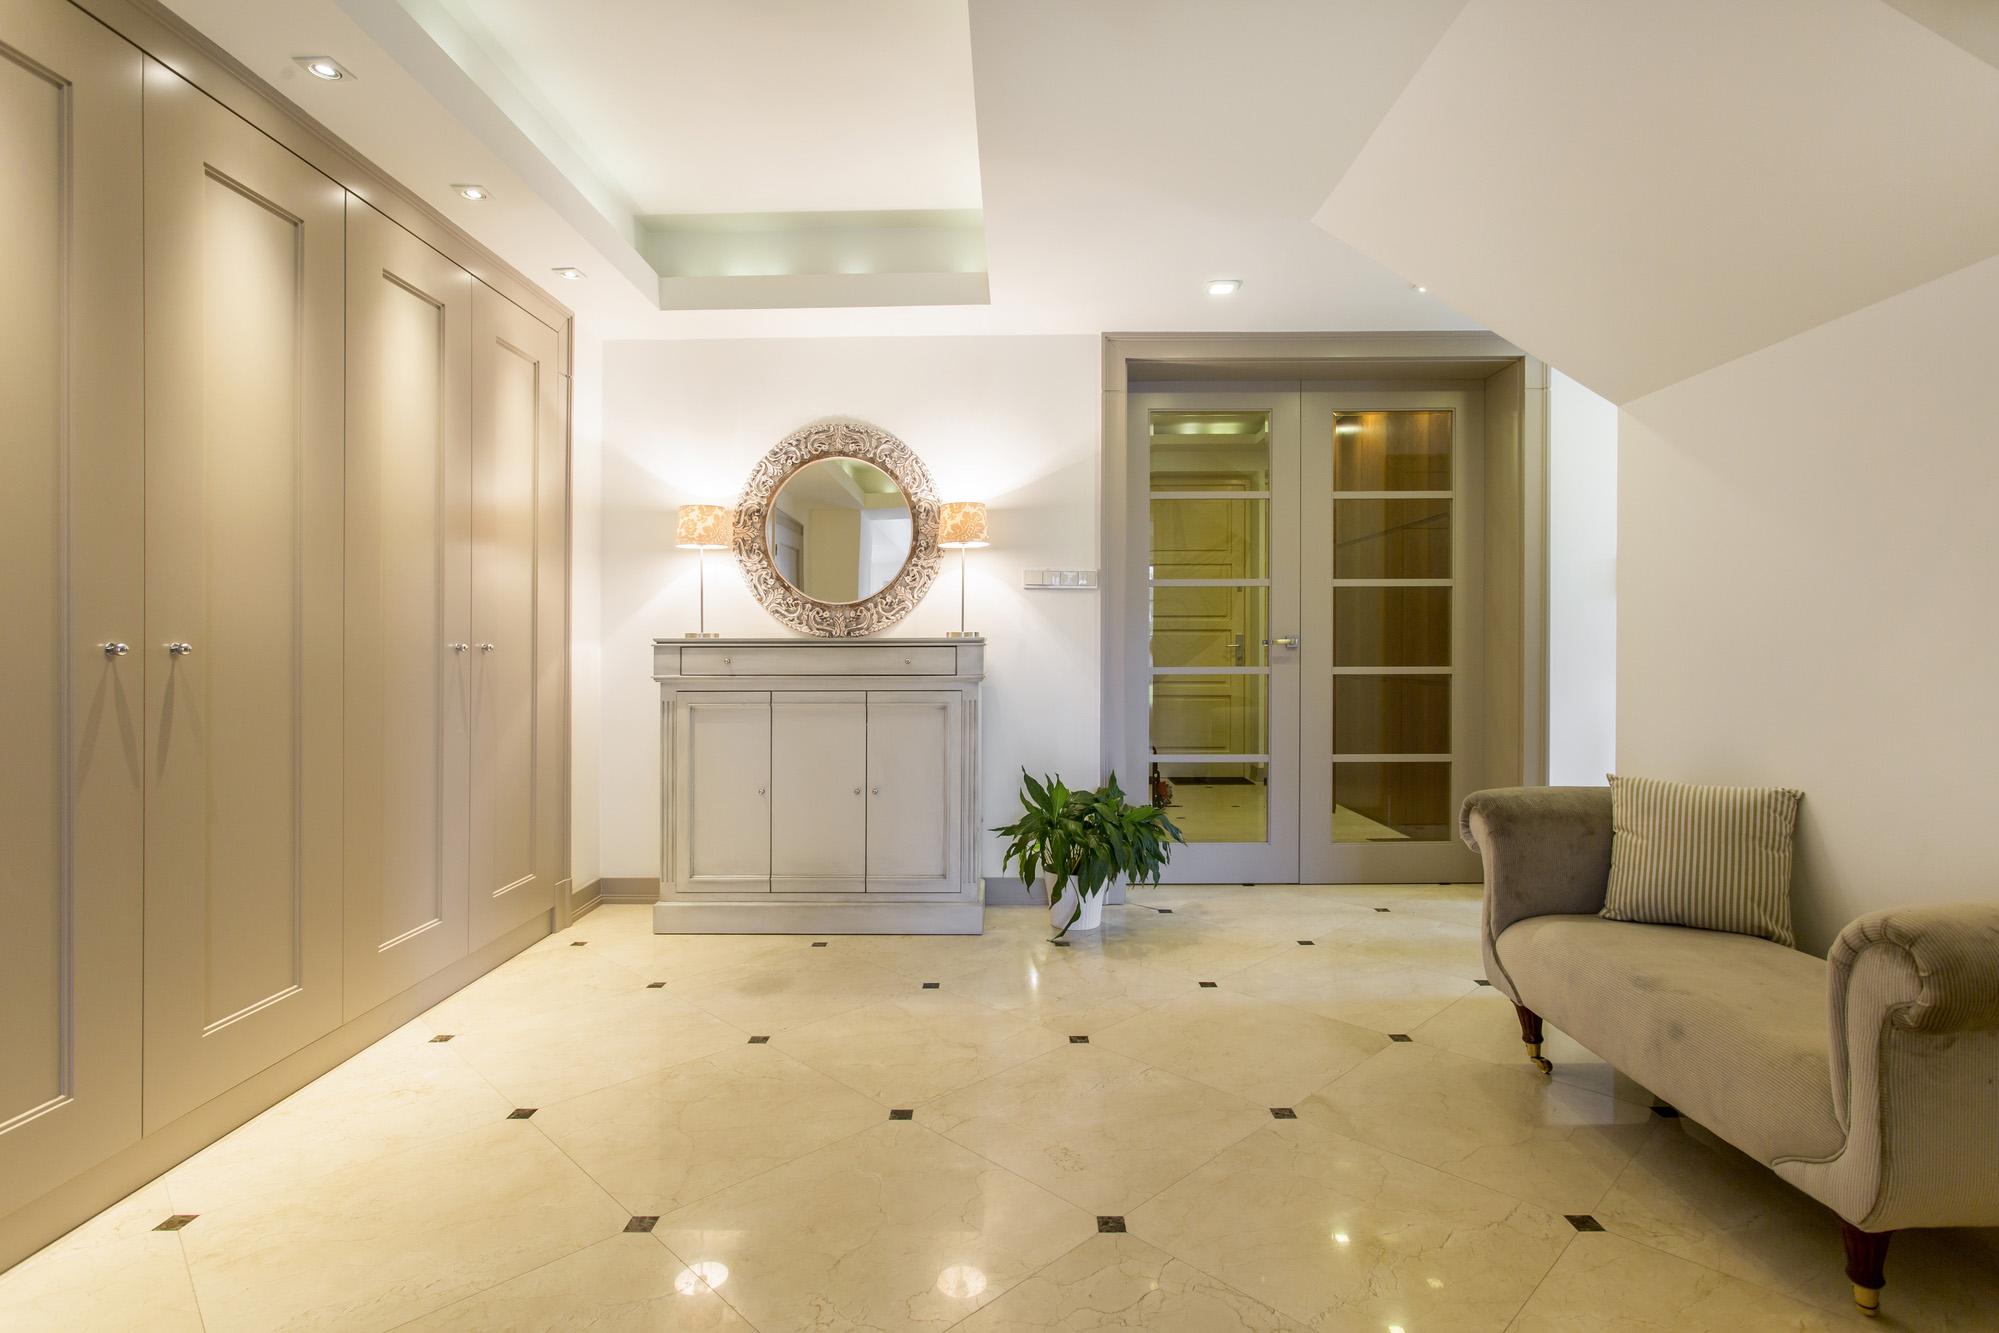 shaker wardrobe doors, fitted wardrobes, wardrobe design